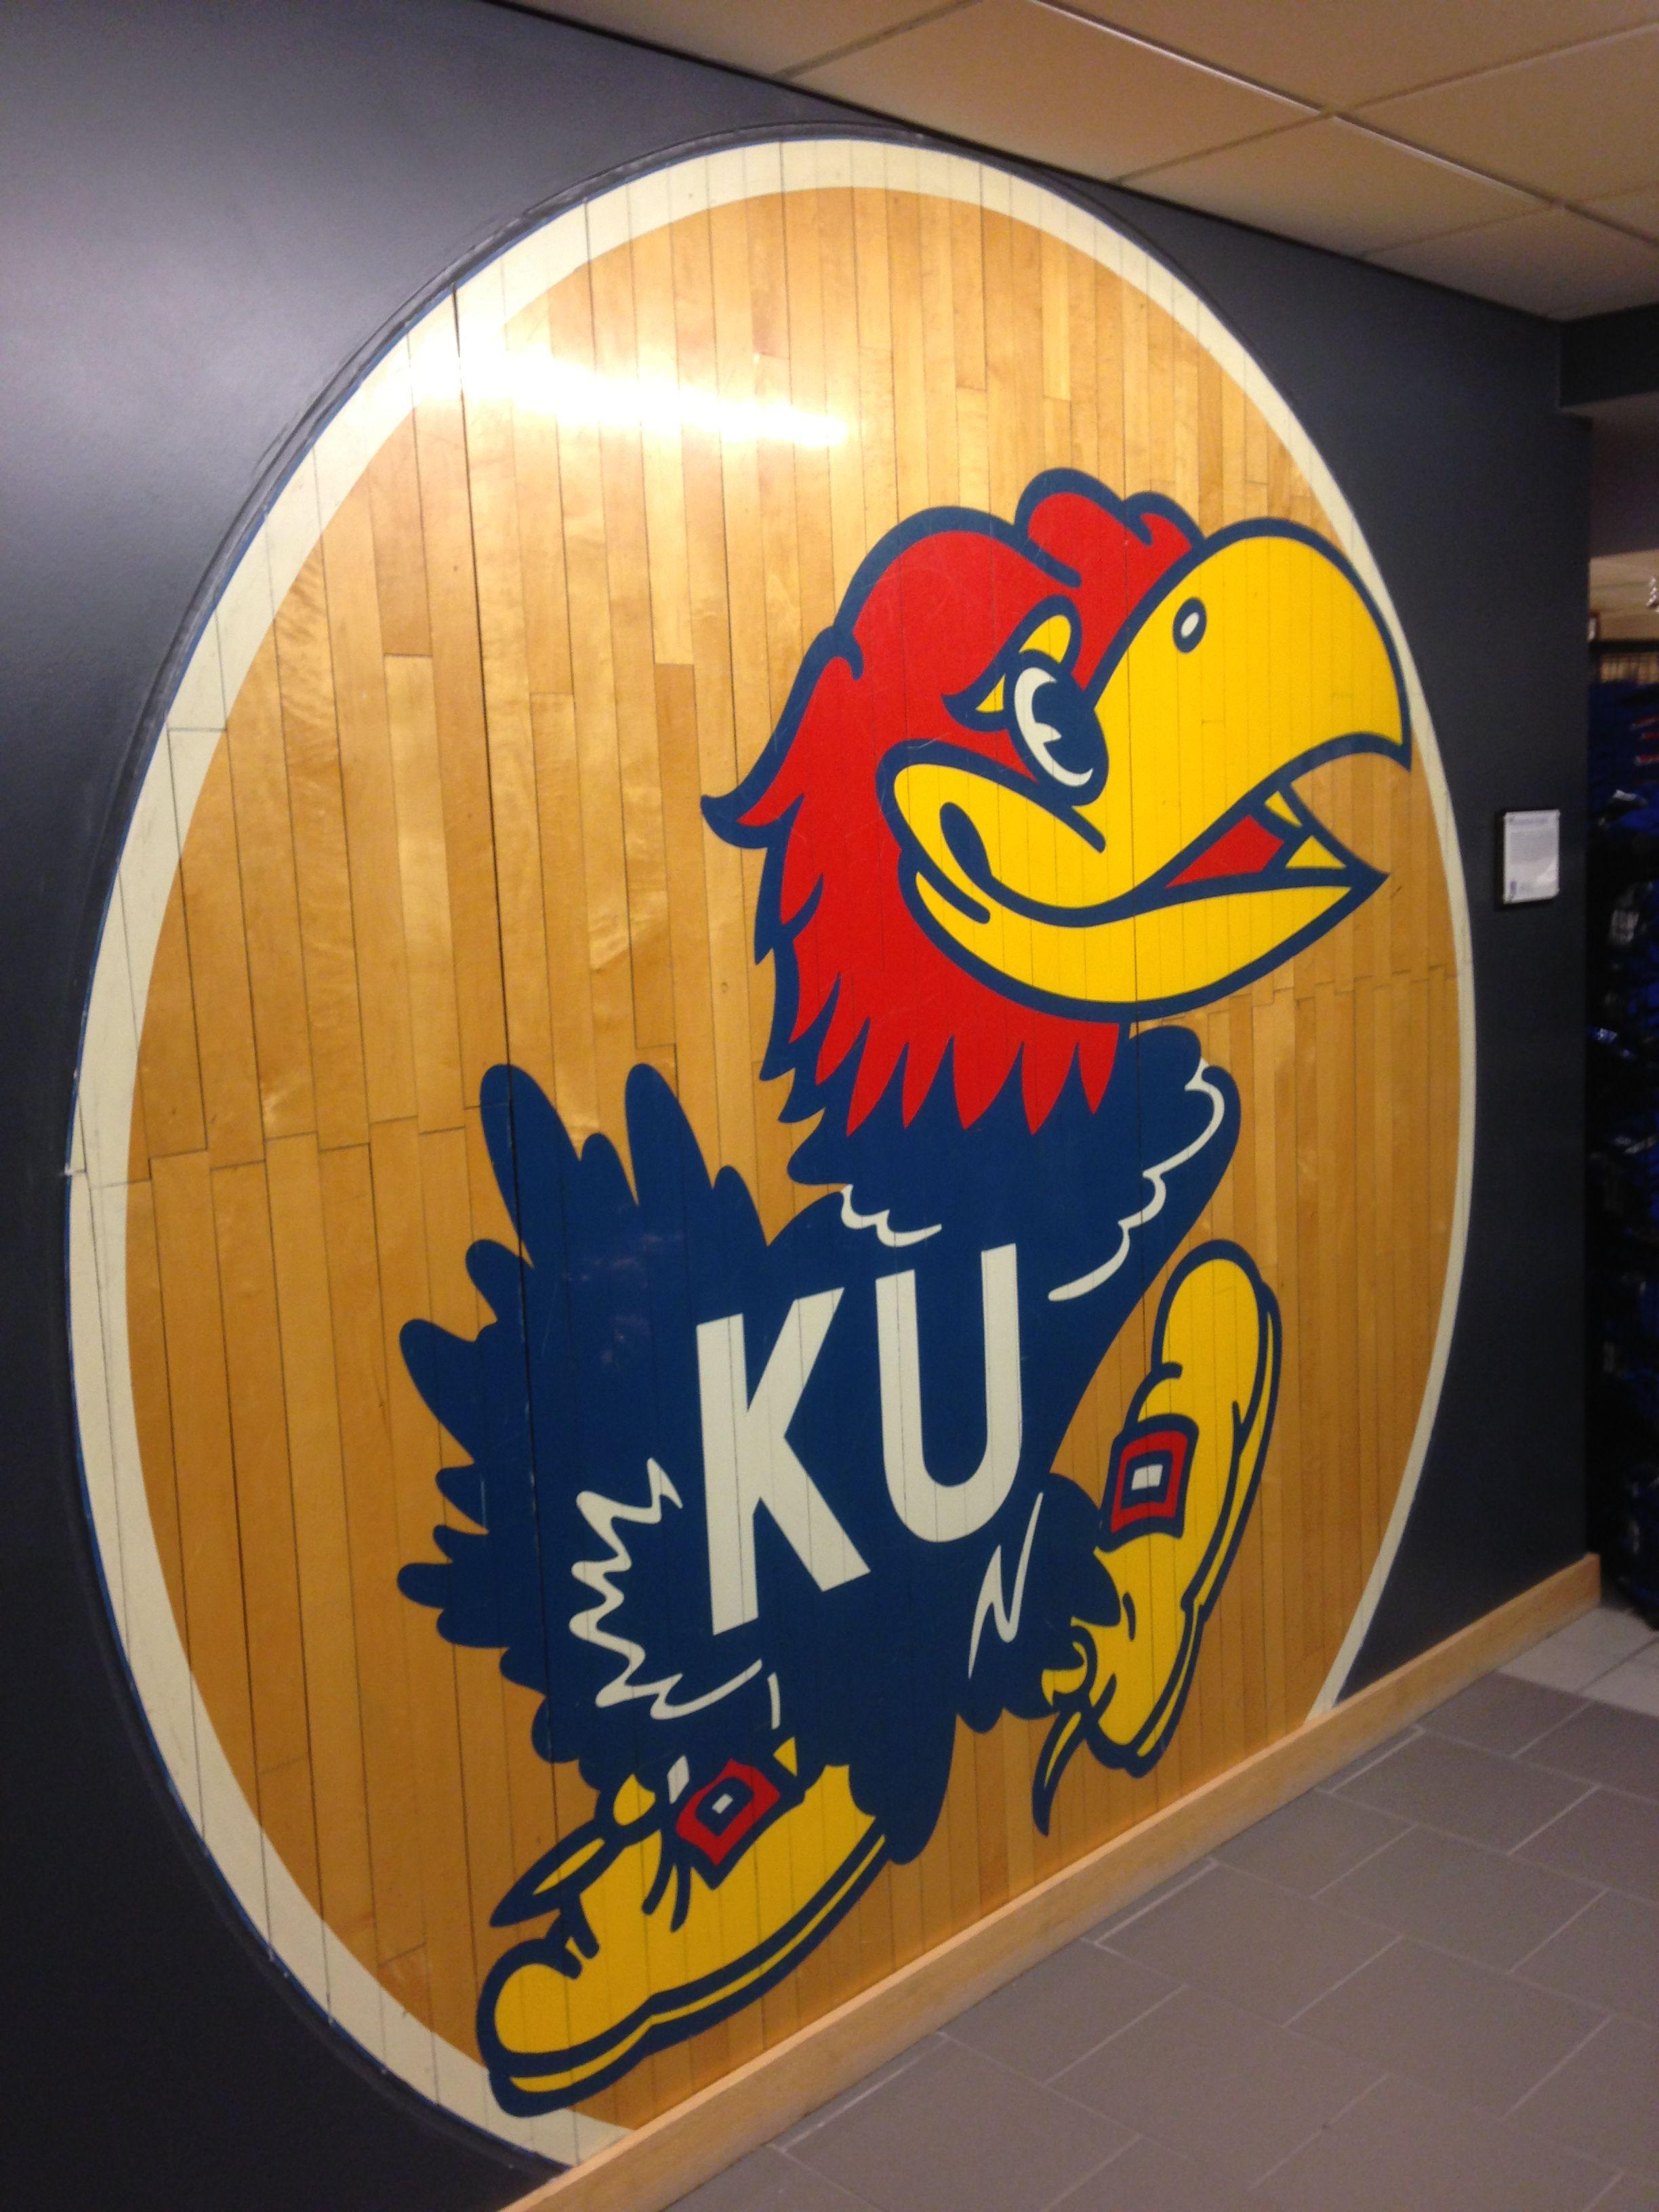 Jayhawk Basketball Floor Student Union Wall Basketball Floor Kansas Jayhawks Kansas Basketball